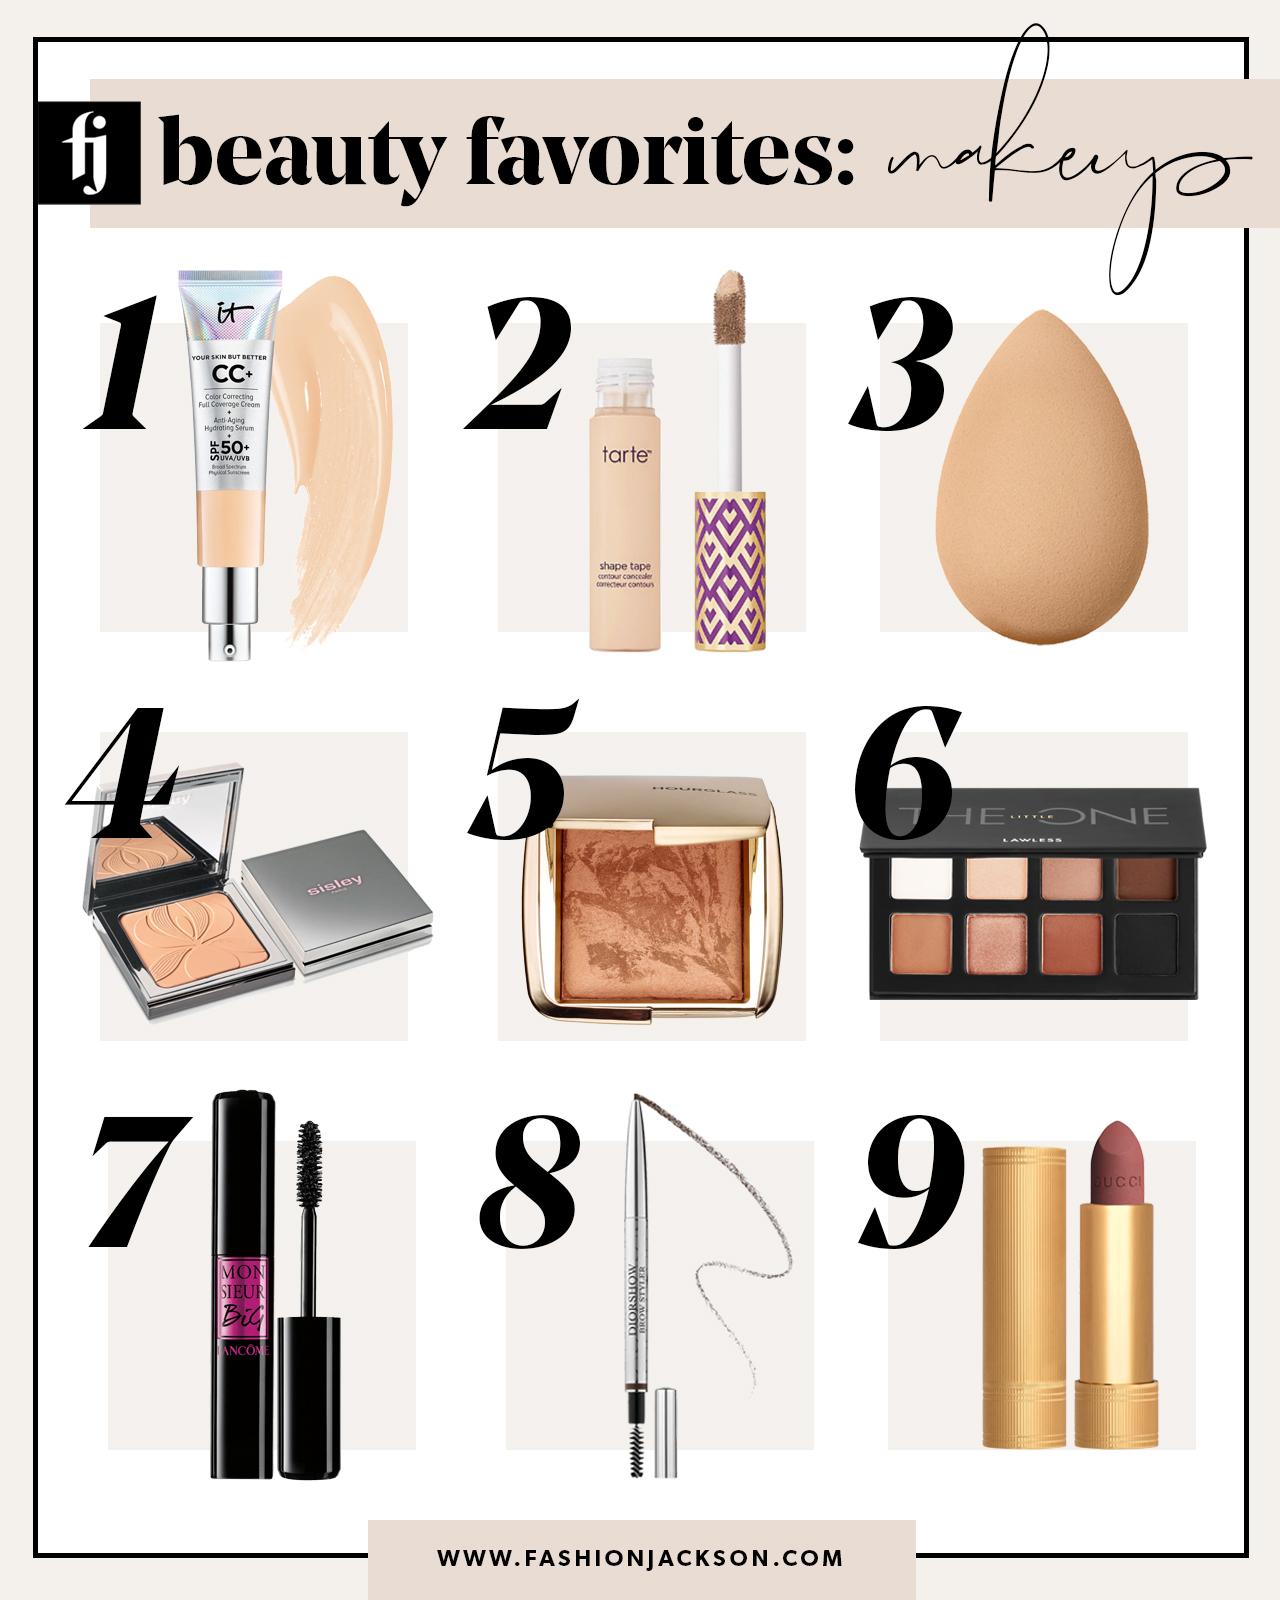 beauty favorites makeup